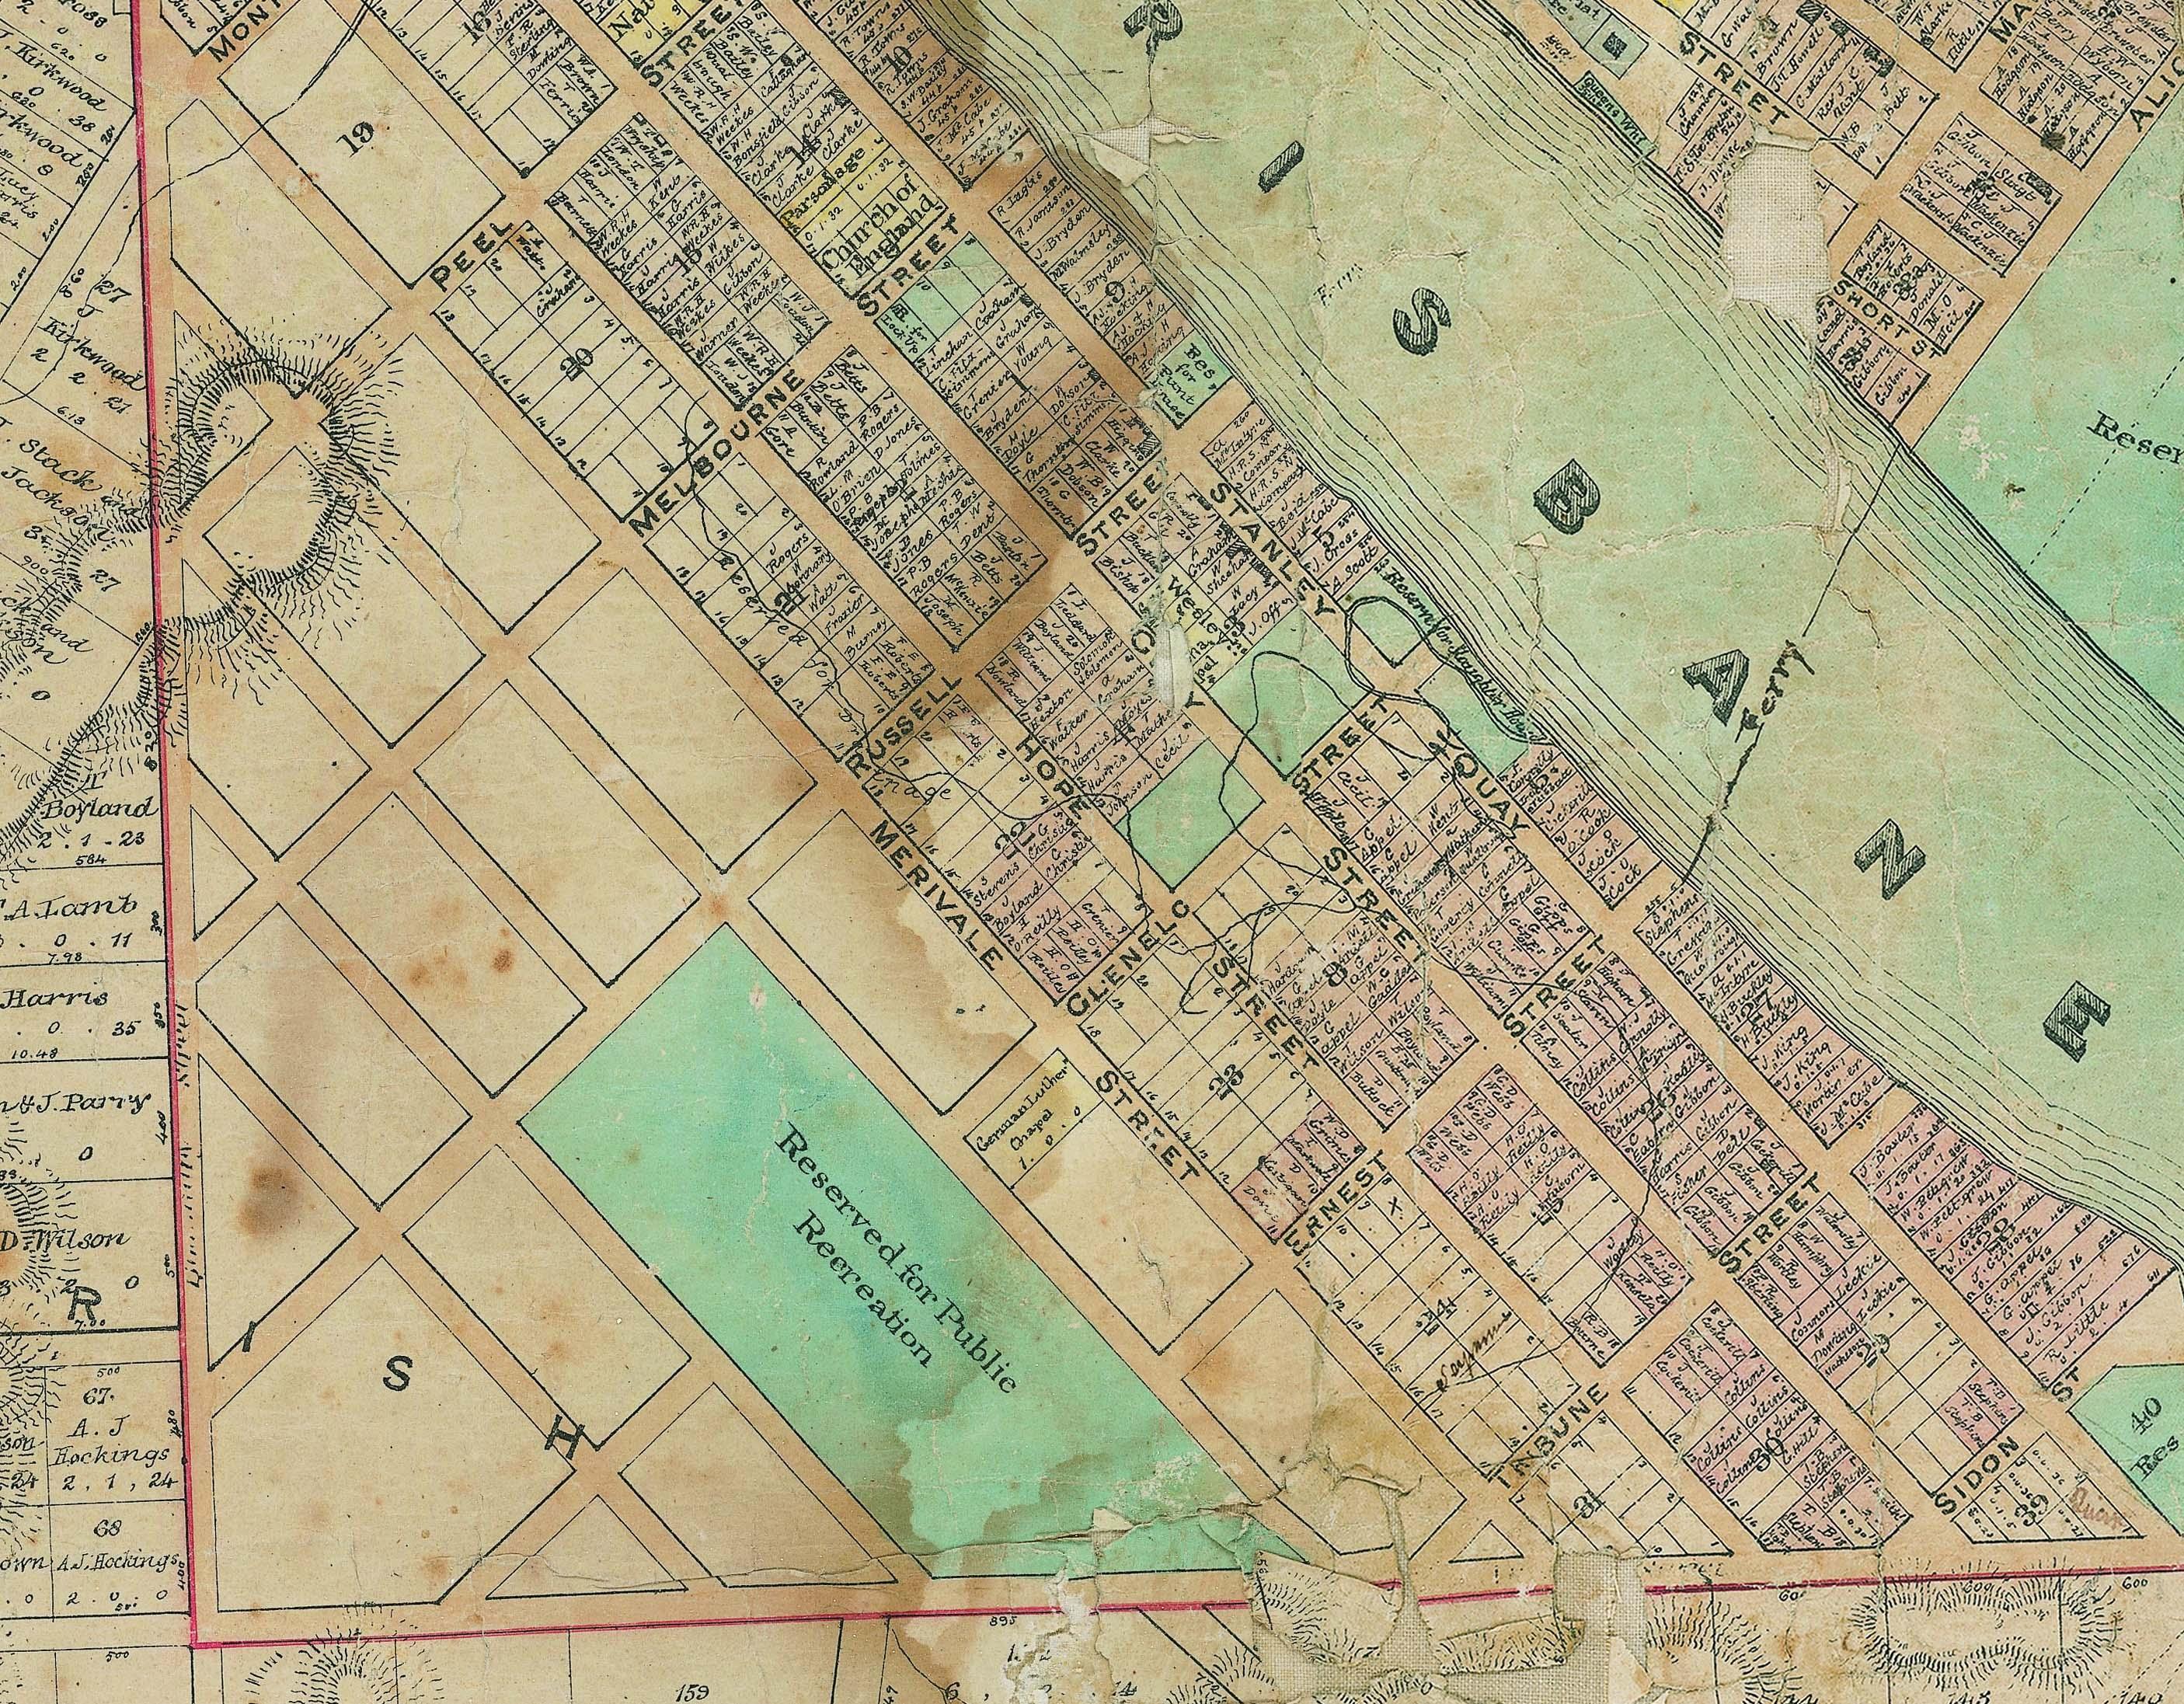 brisbane map 1858 recreation reserve